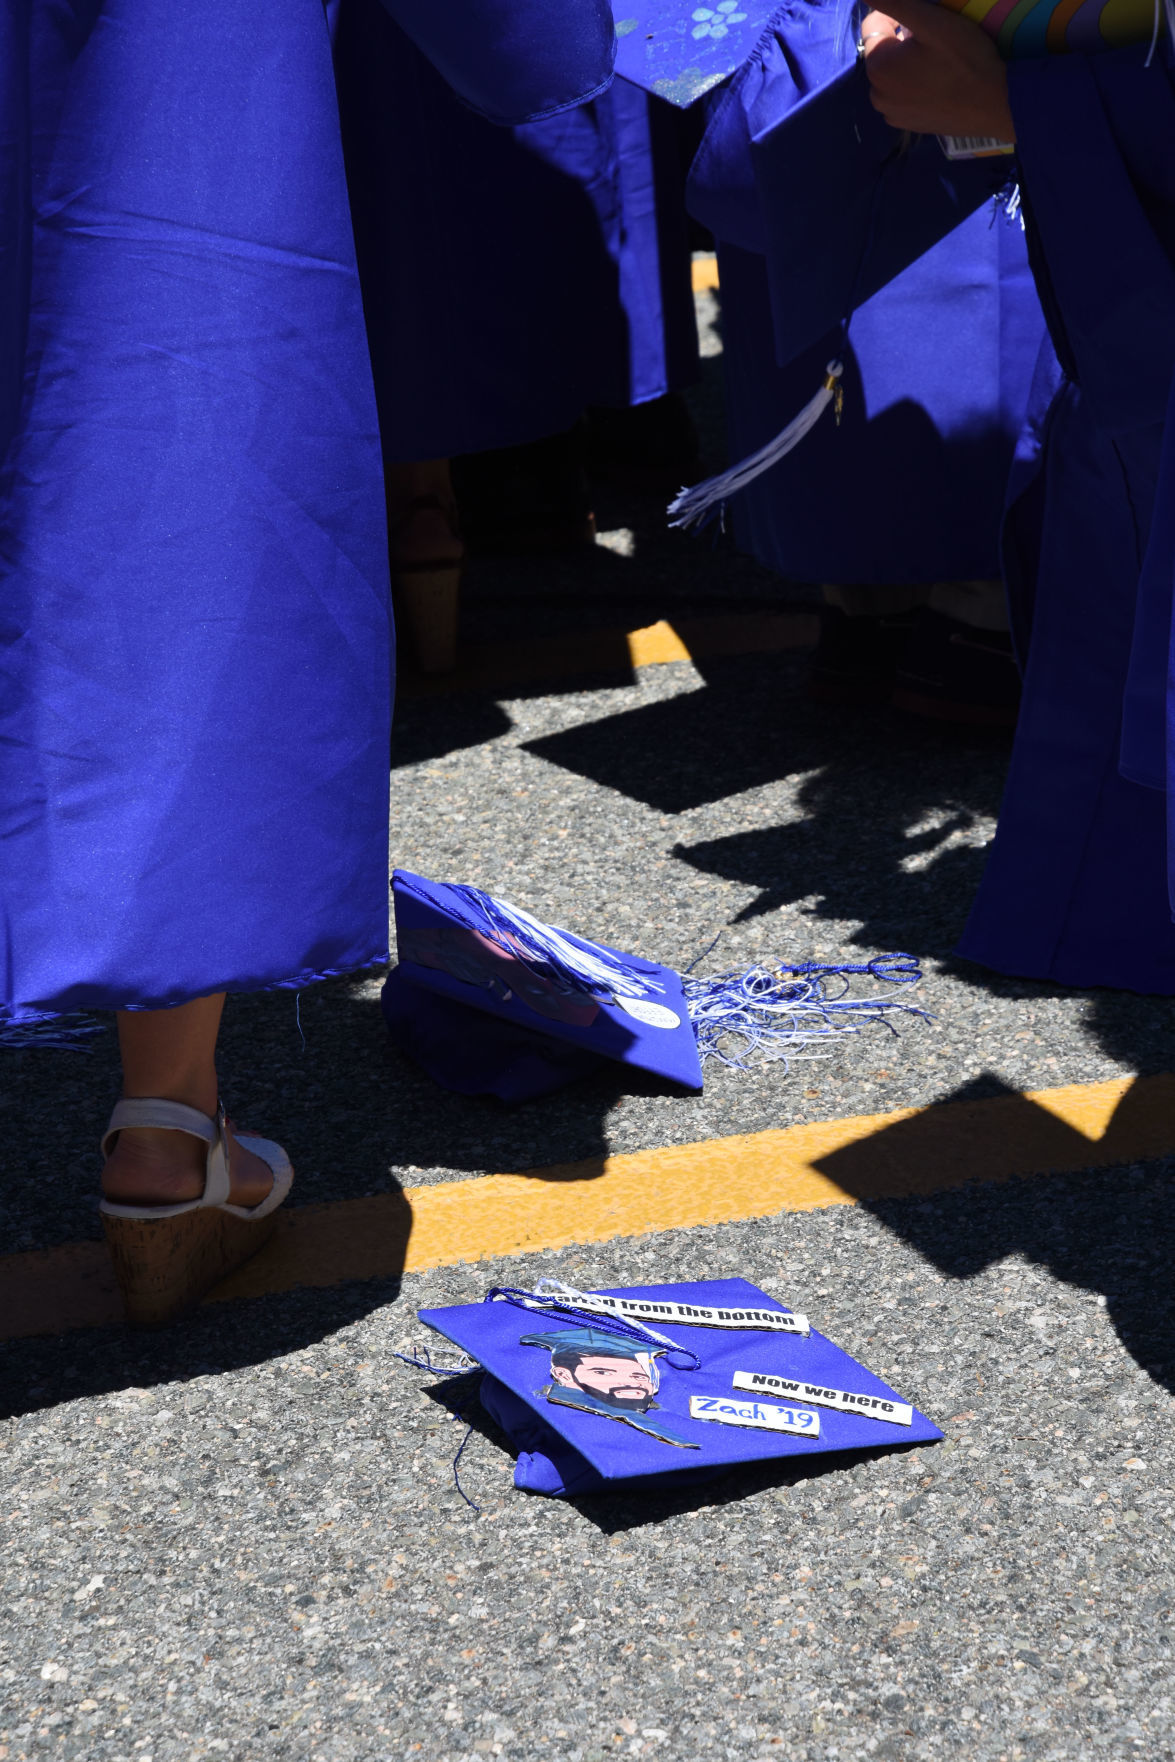 Mashpee High School Graduation - June 8, 2019